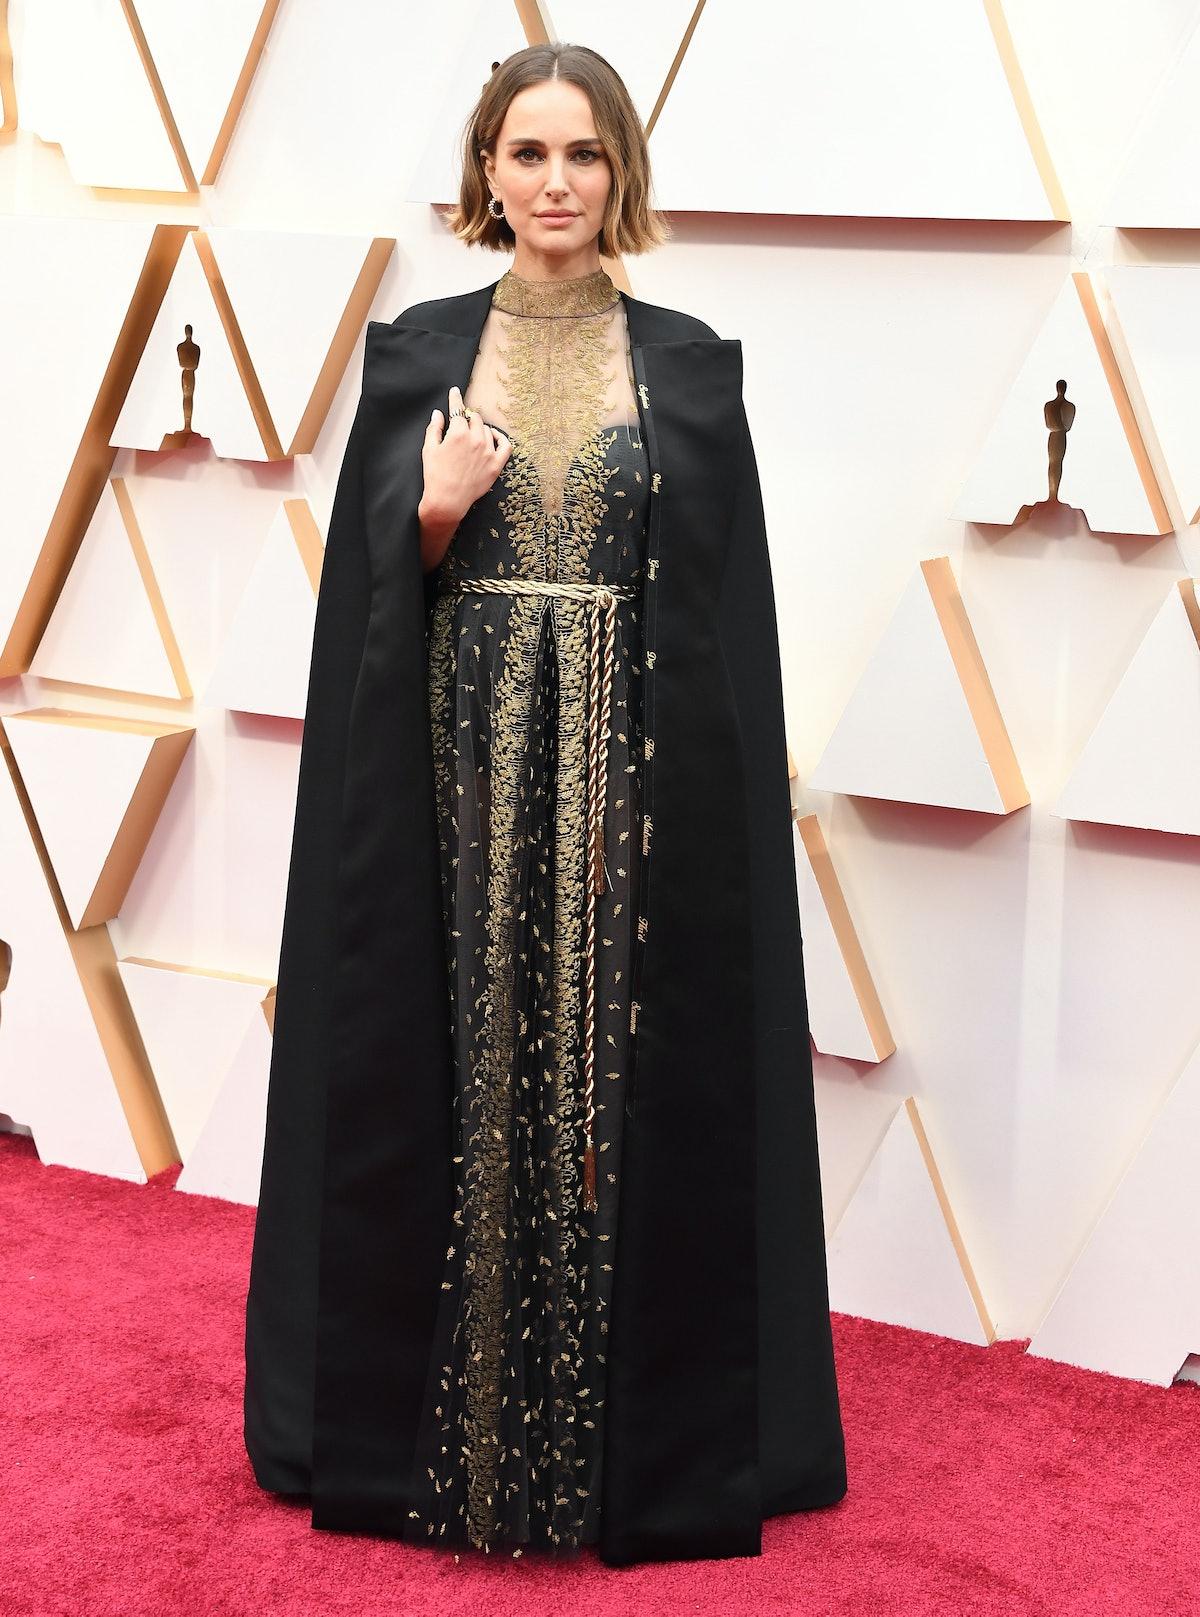 Natalie Portman in black and gold.